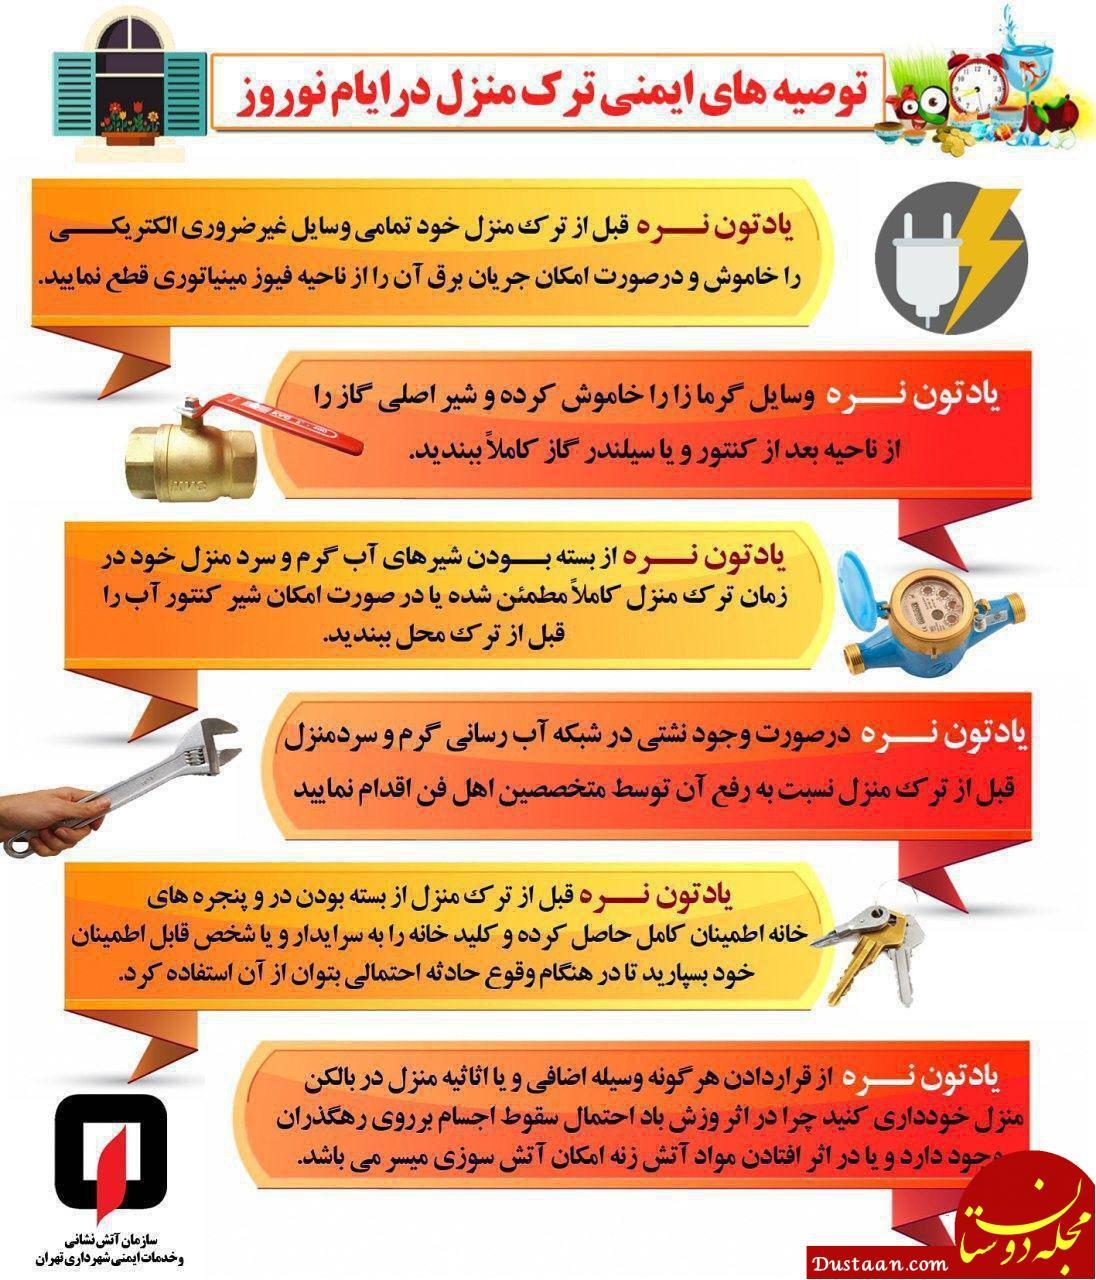 www.dustaan.com توصیه های ایمنی را پیش از ترک خانه برای مسافرت نوروزی